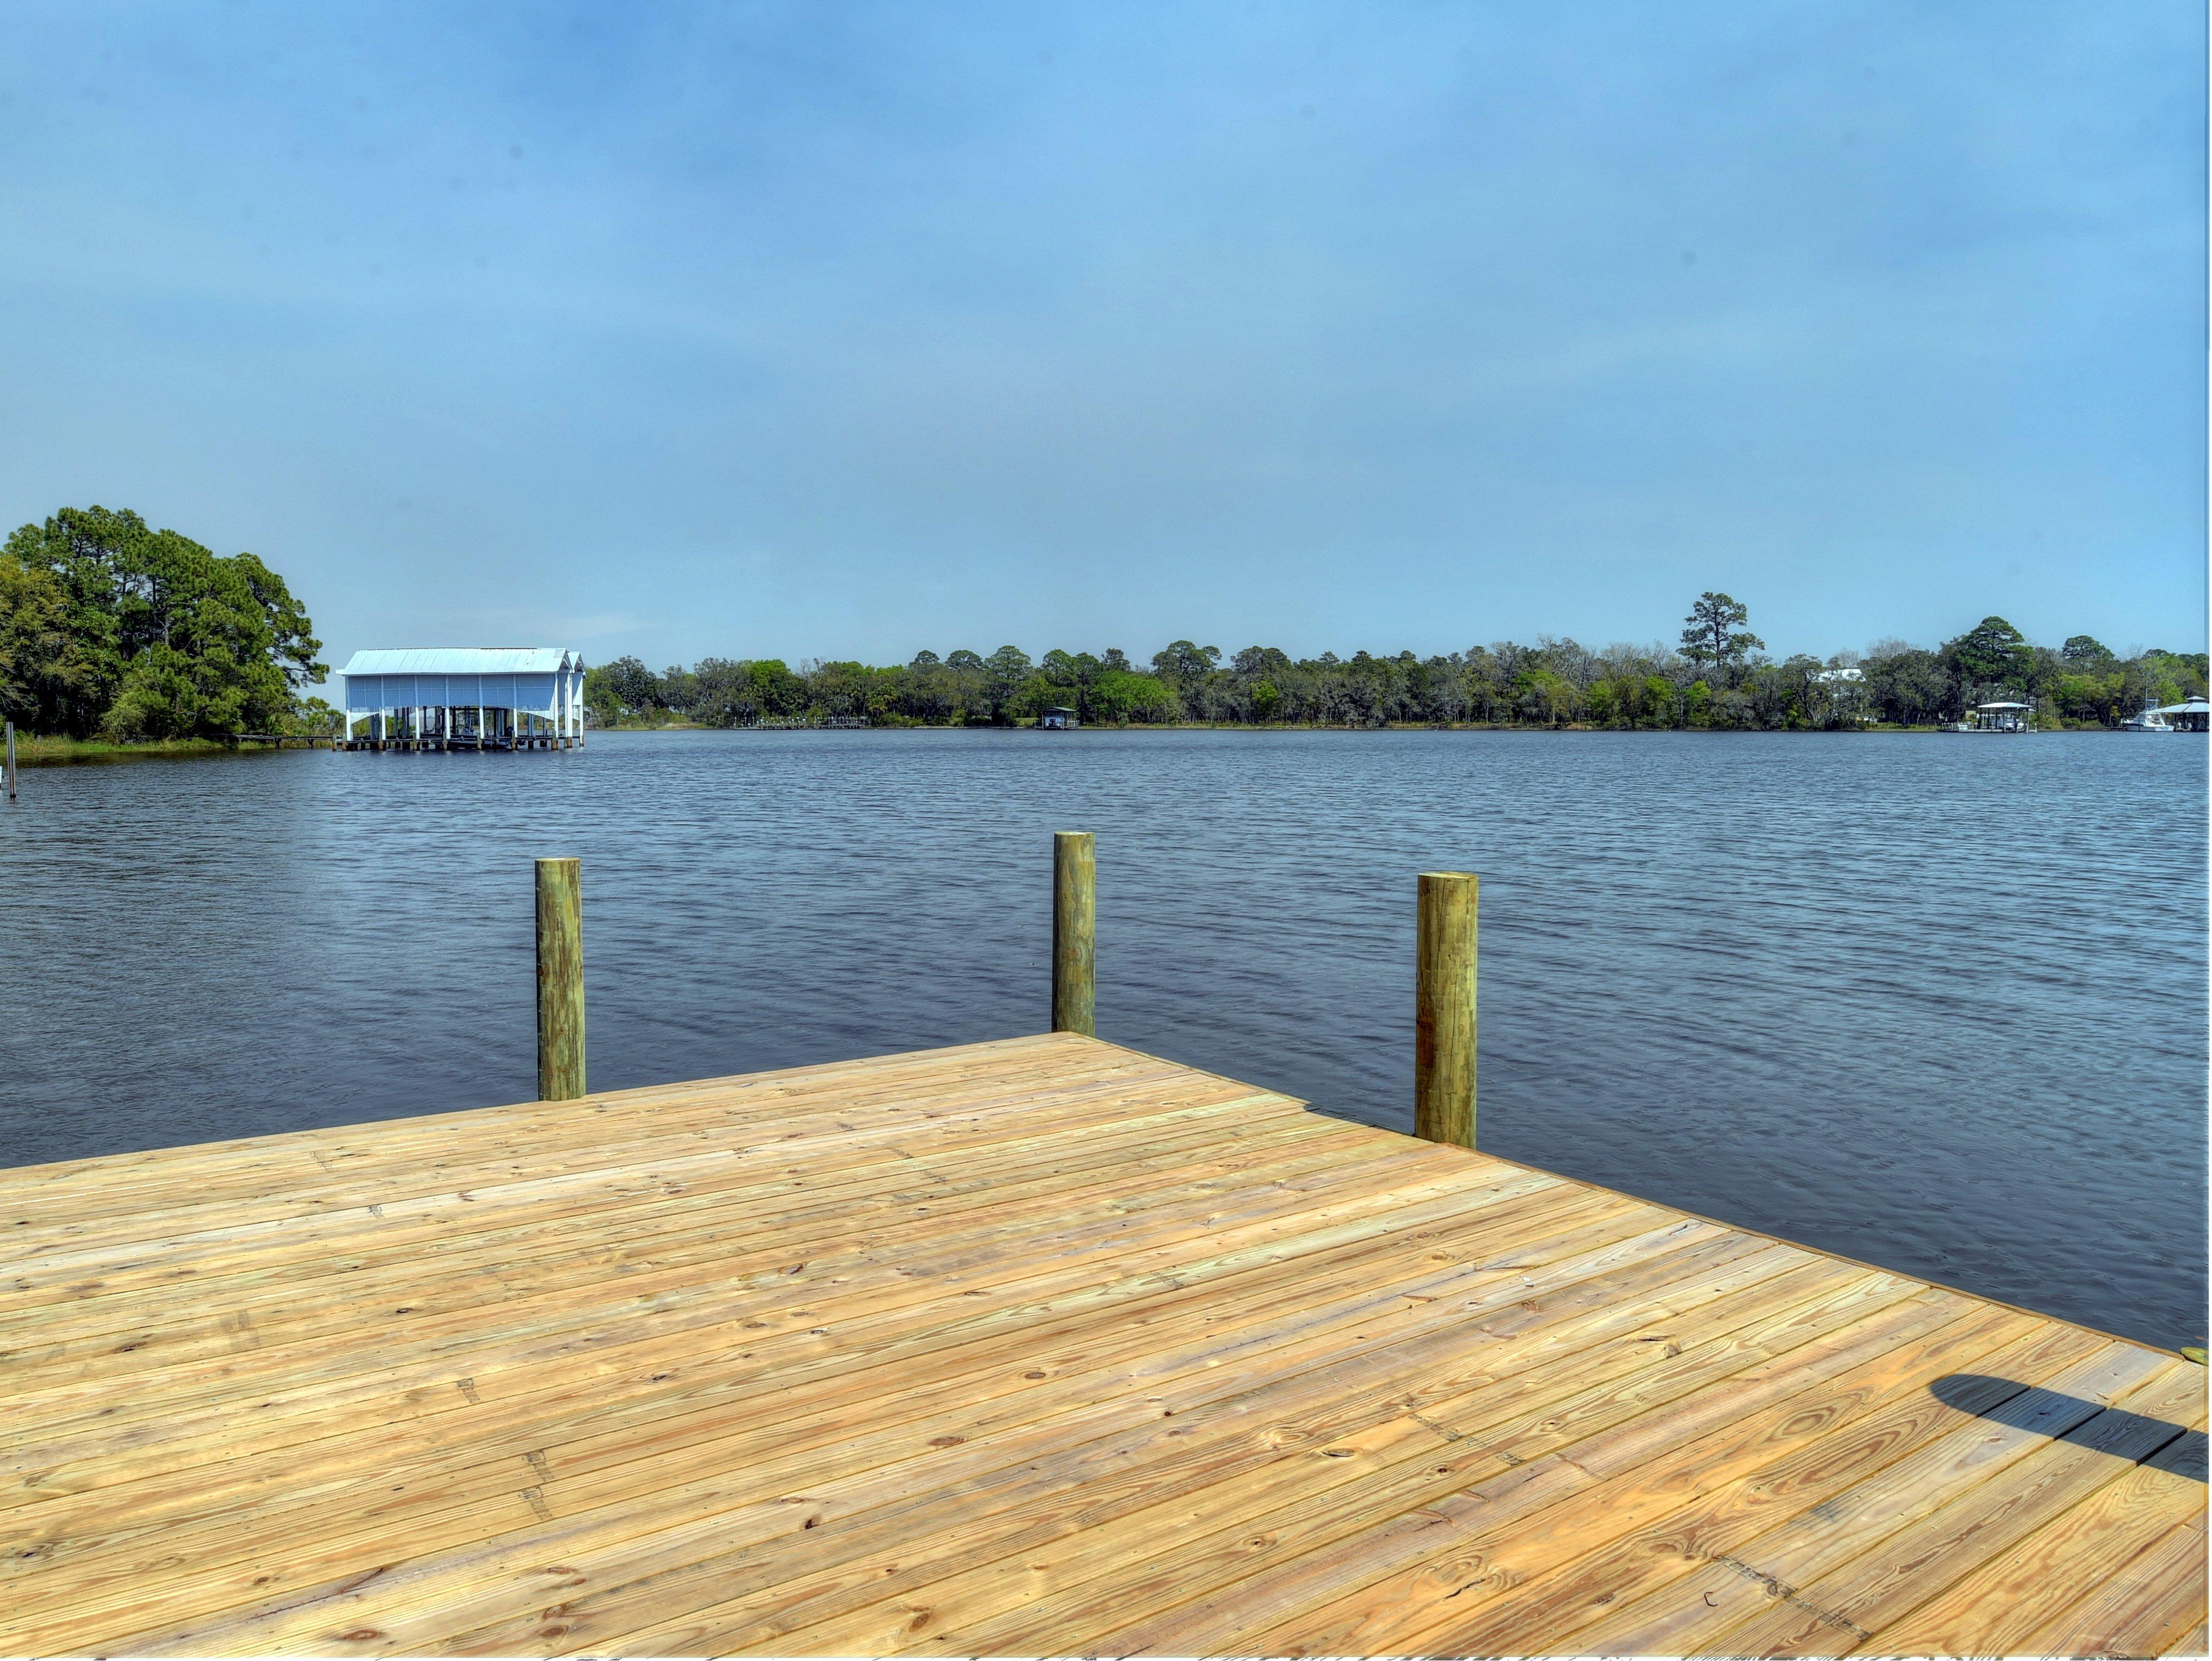 93 Beacon Point Condo rental in Sandestin Rentals ~ Cottages and Villas  in Destin Florida - #2